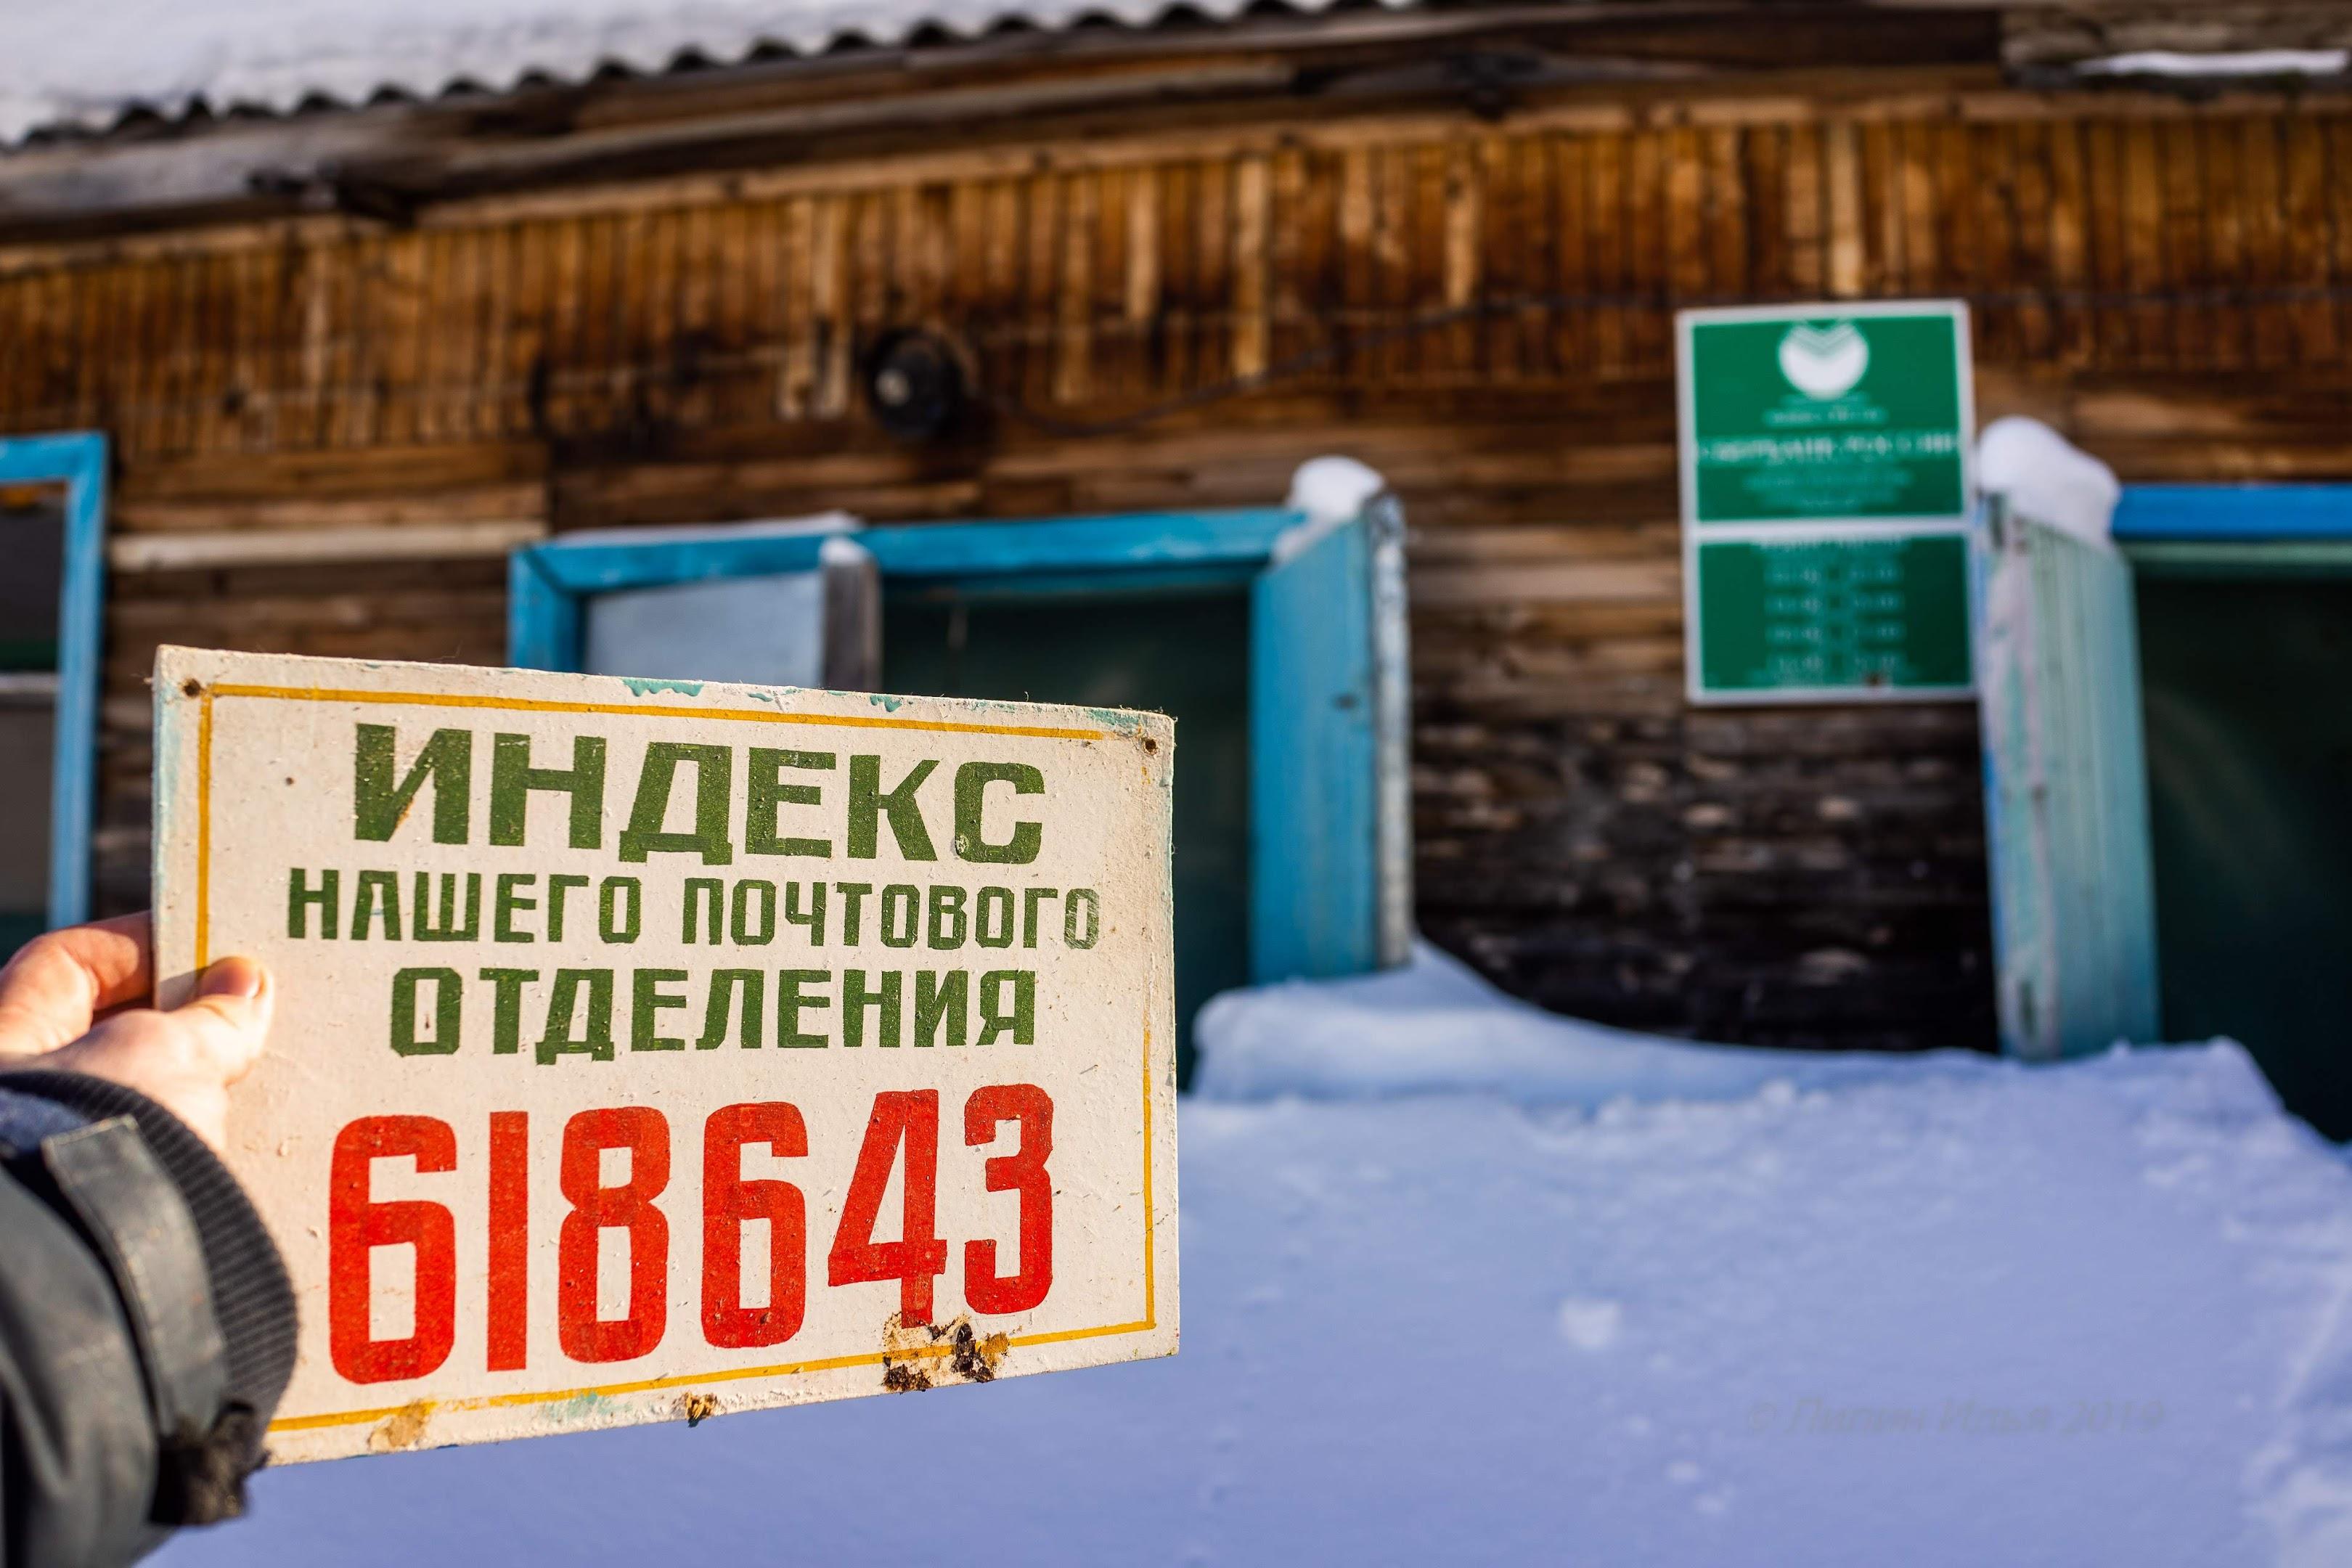 Пишите письма мелким почерком. Адрес знаете. 618643, поселок В.Колва.